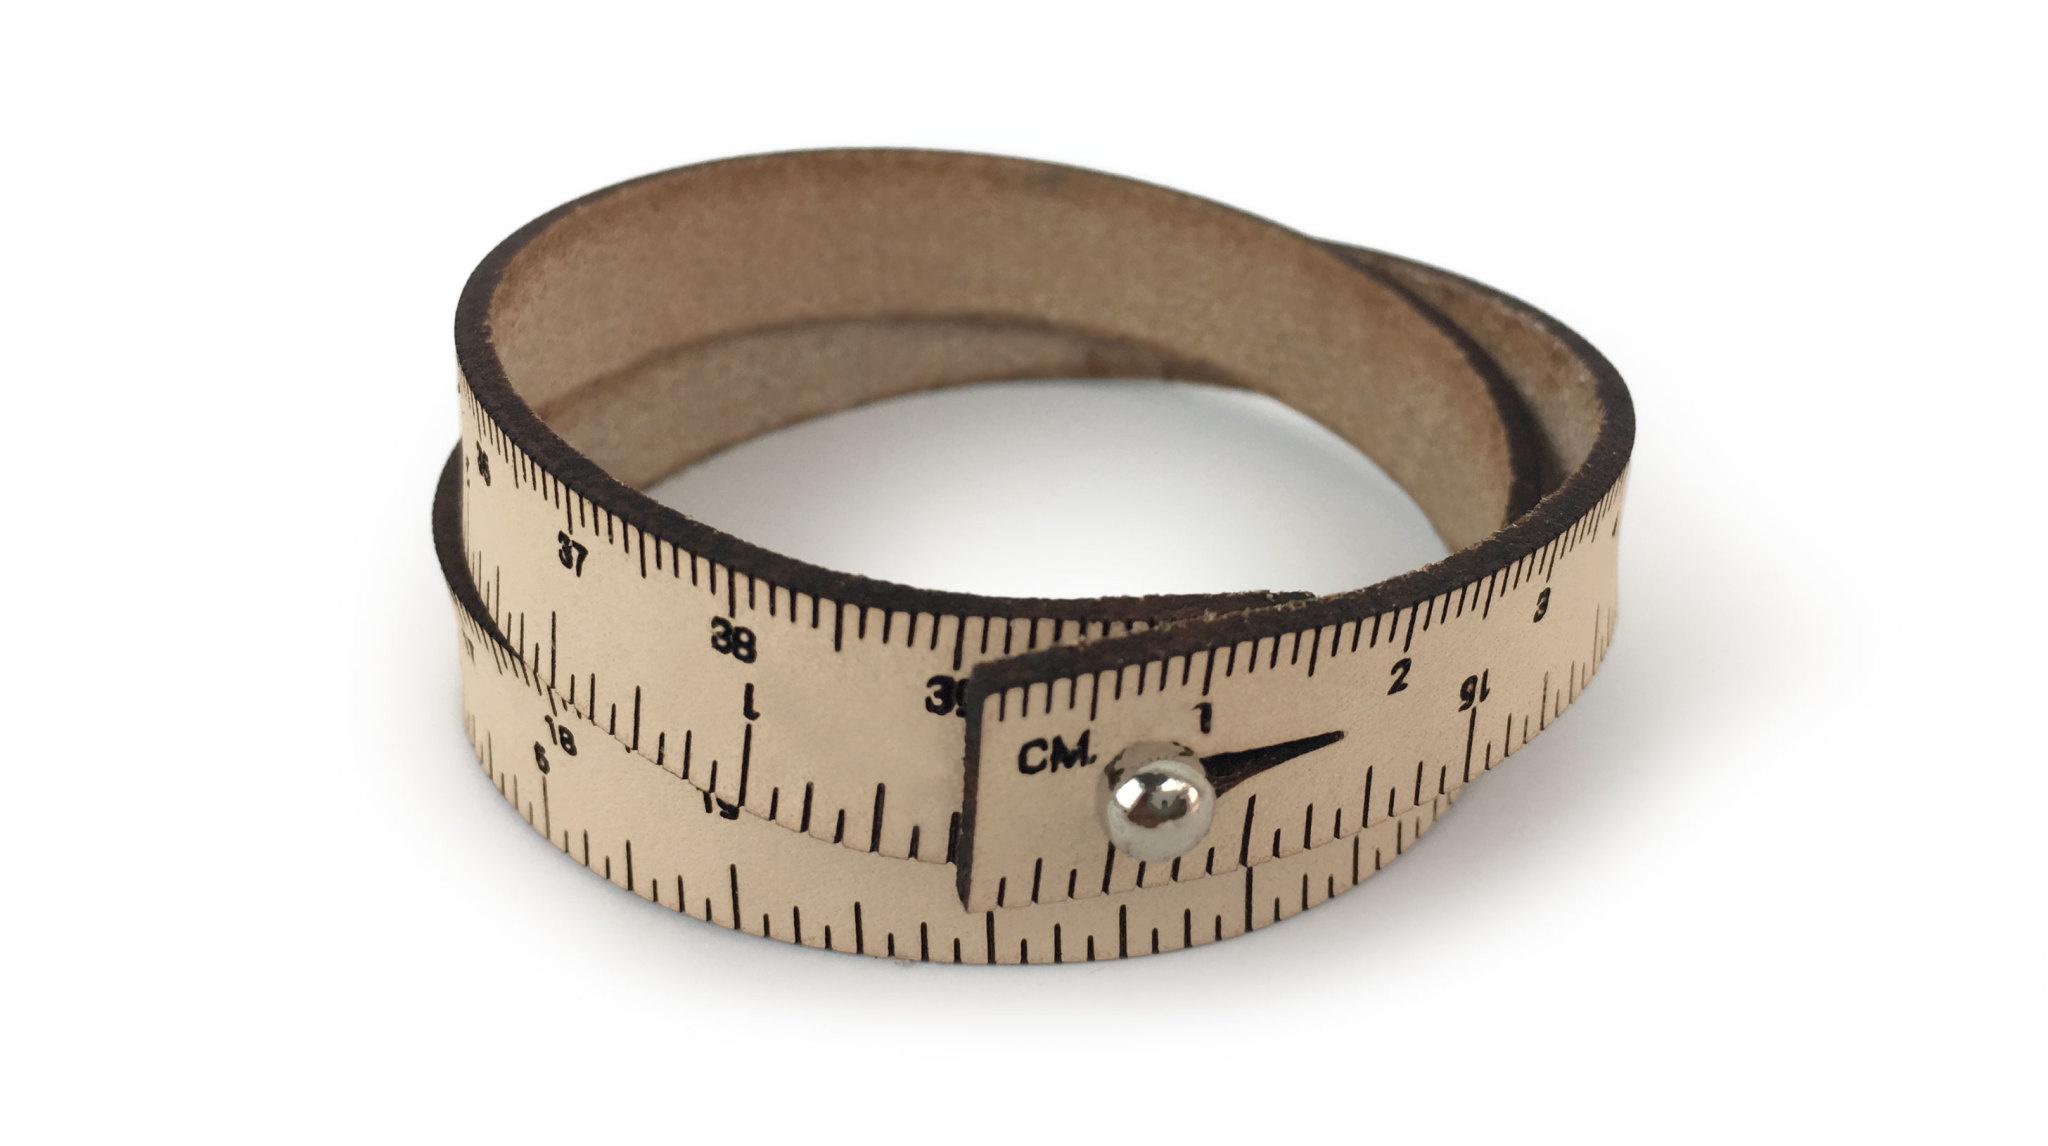 I Love Handles Wrist Ruler M15